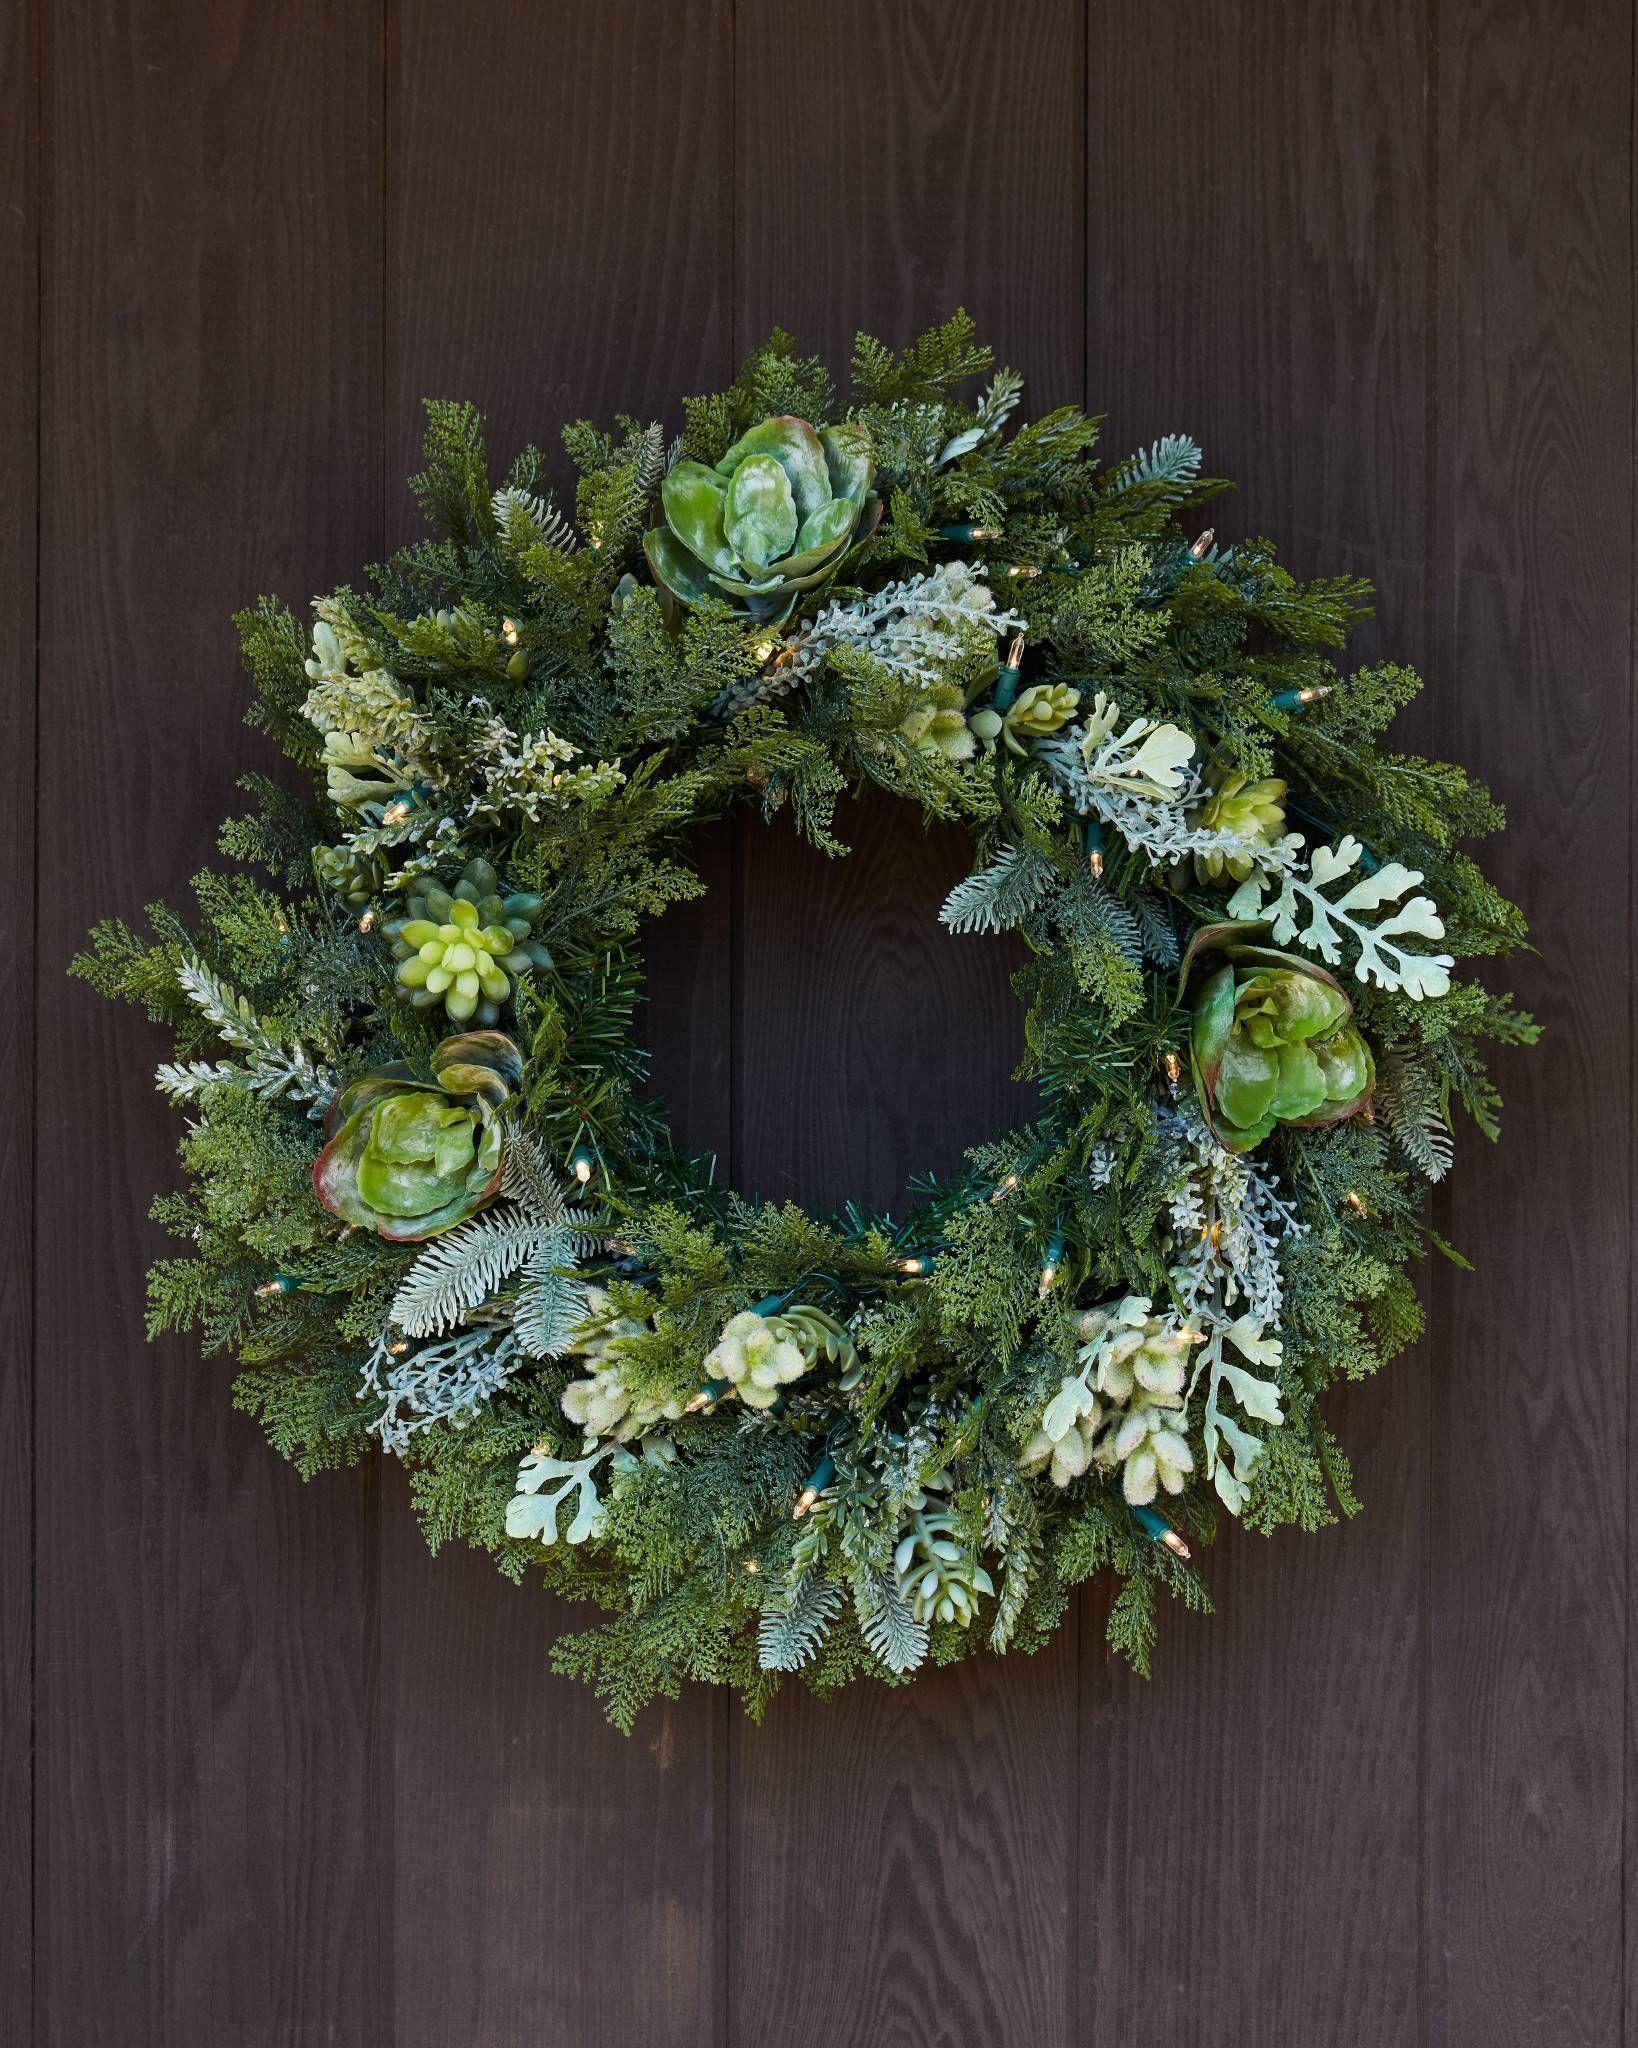 Winter Succulent Artificial Foliage | Balsam Hill